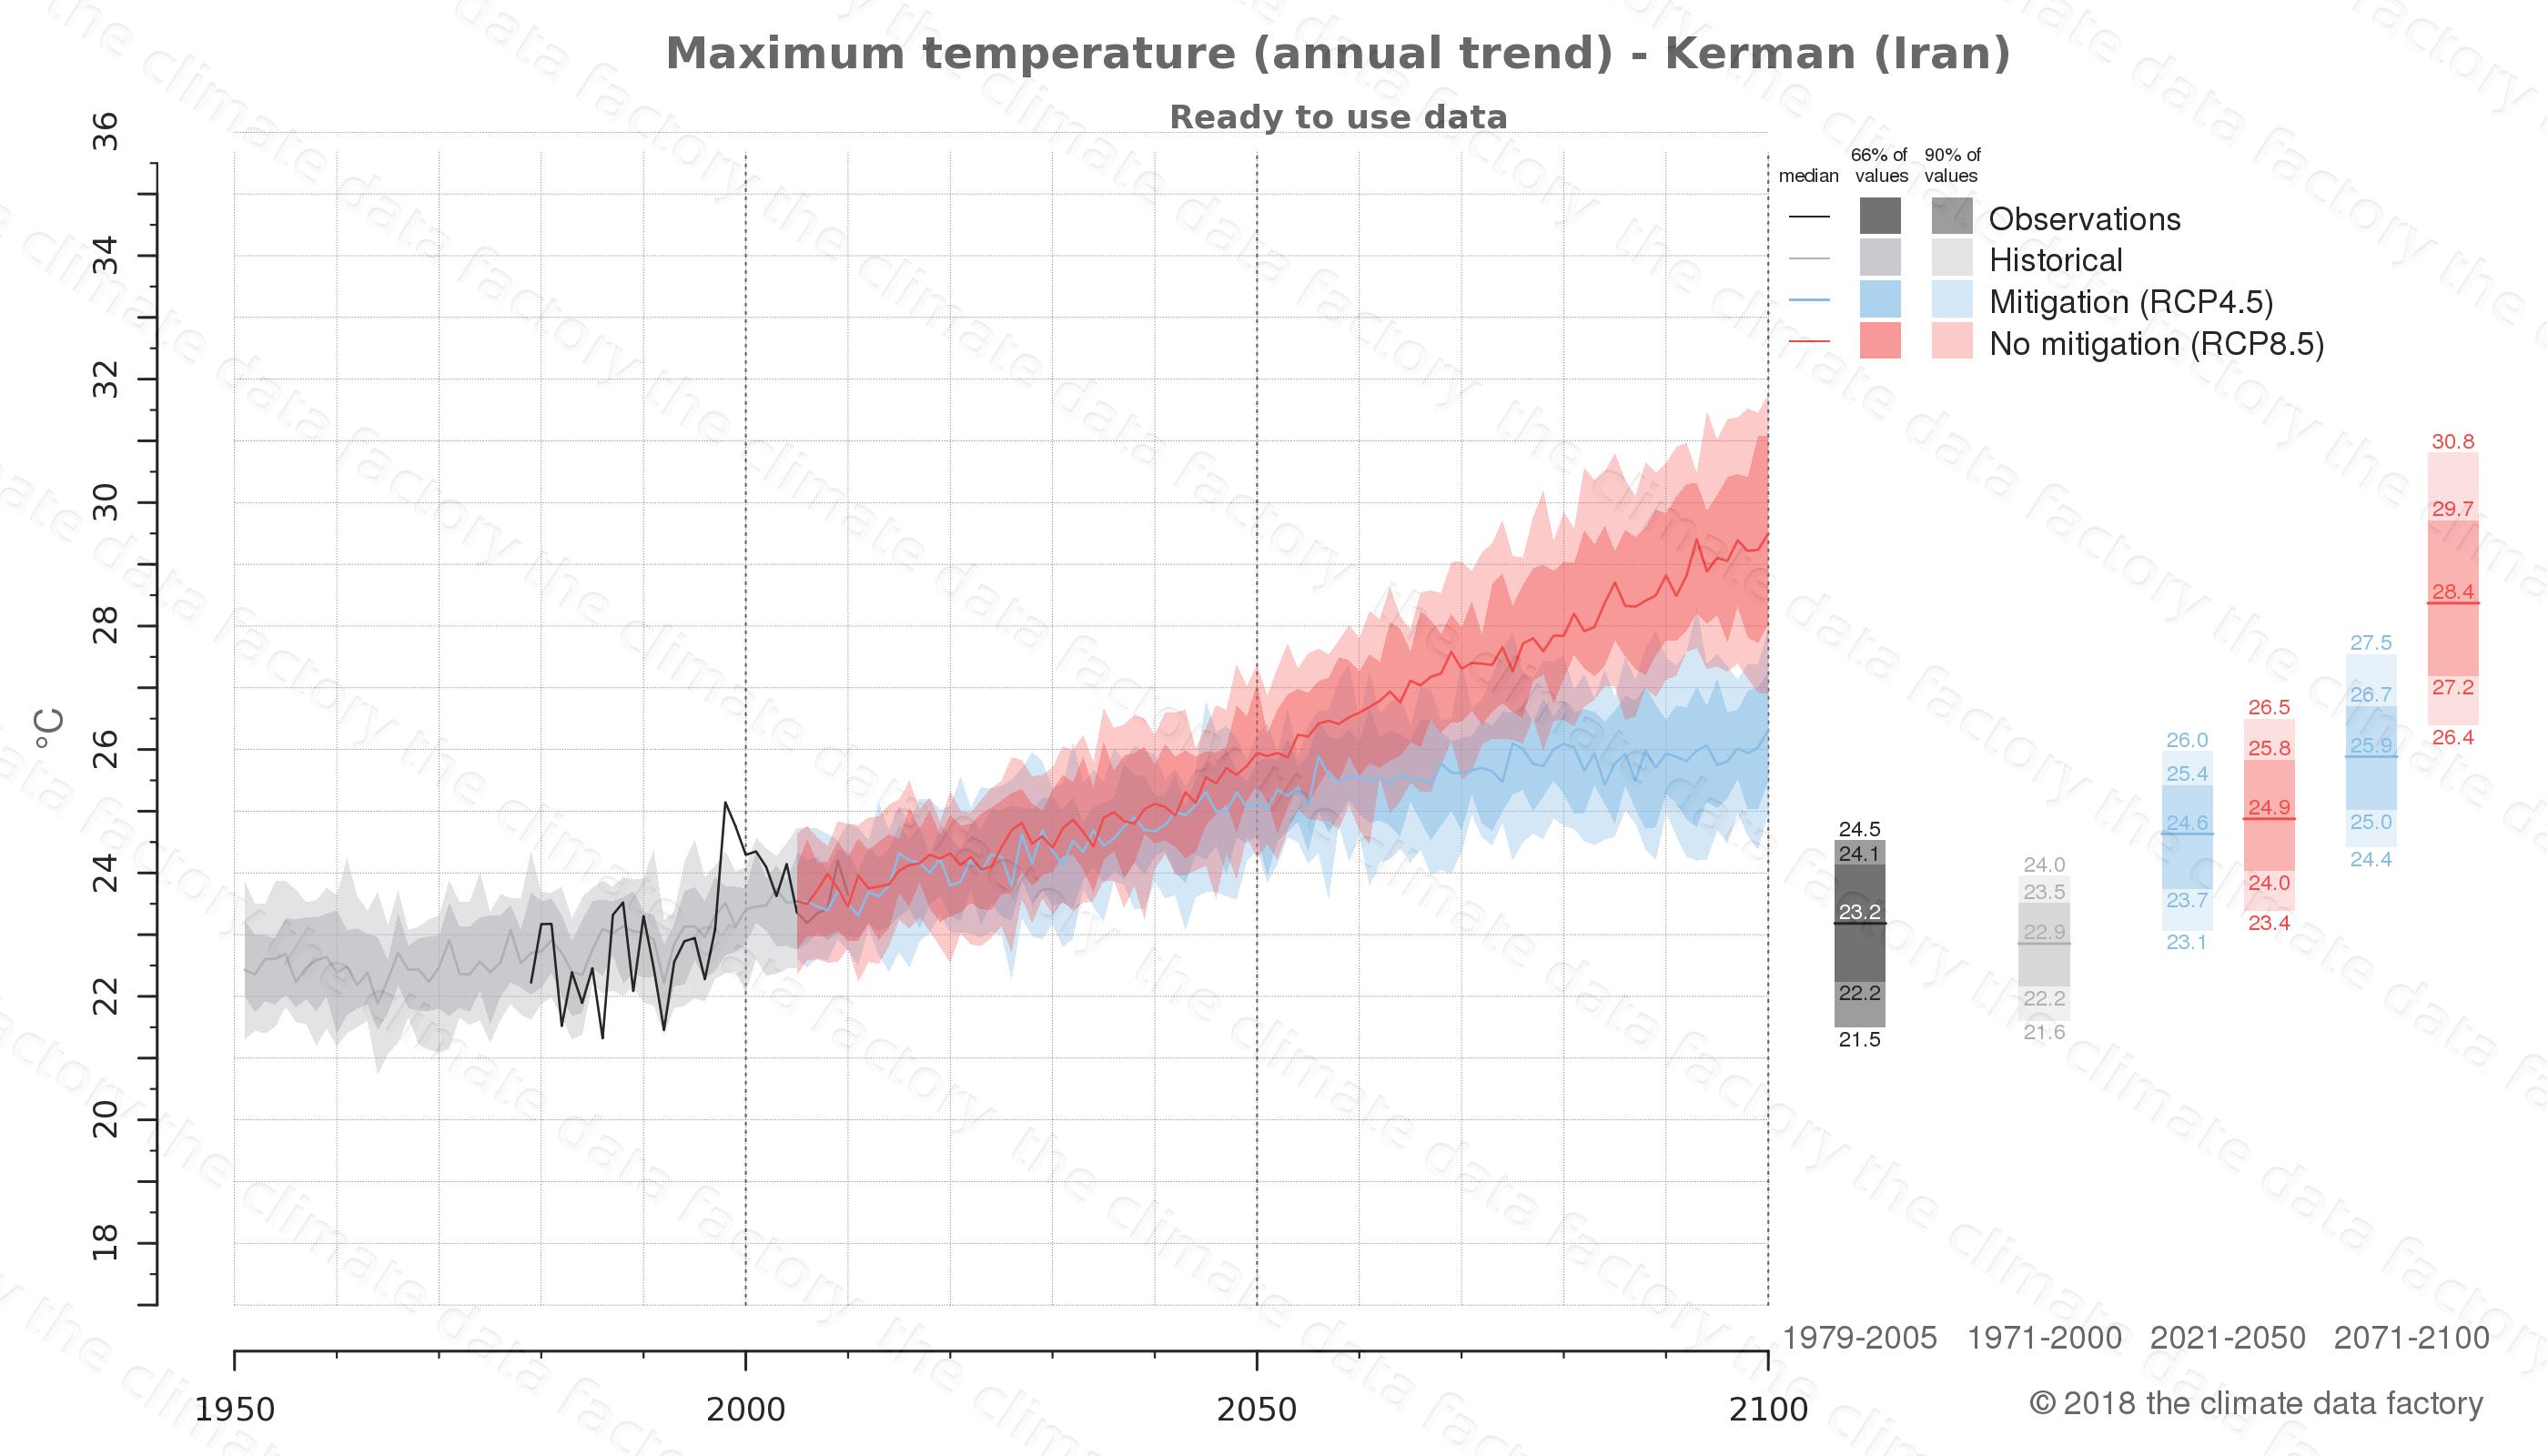 climate change data policy adaptation climate graph city data maximum-temperature kerman iran